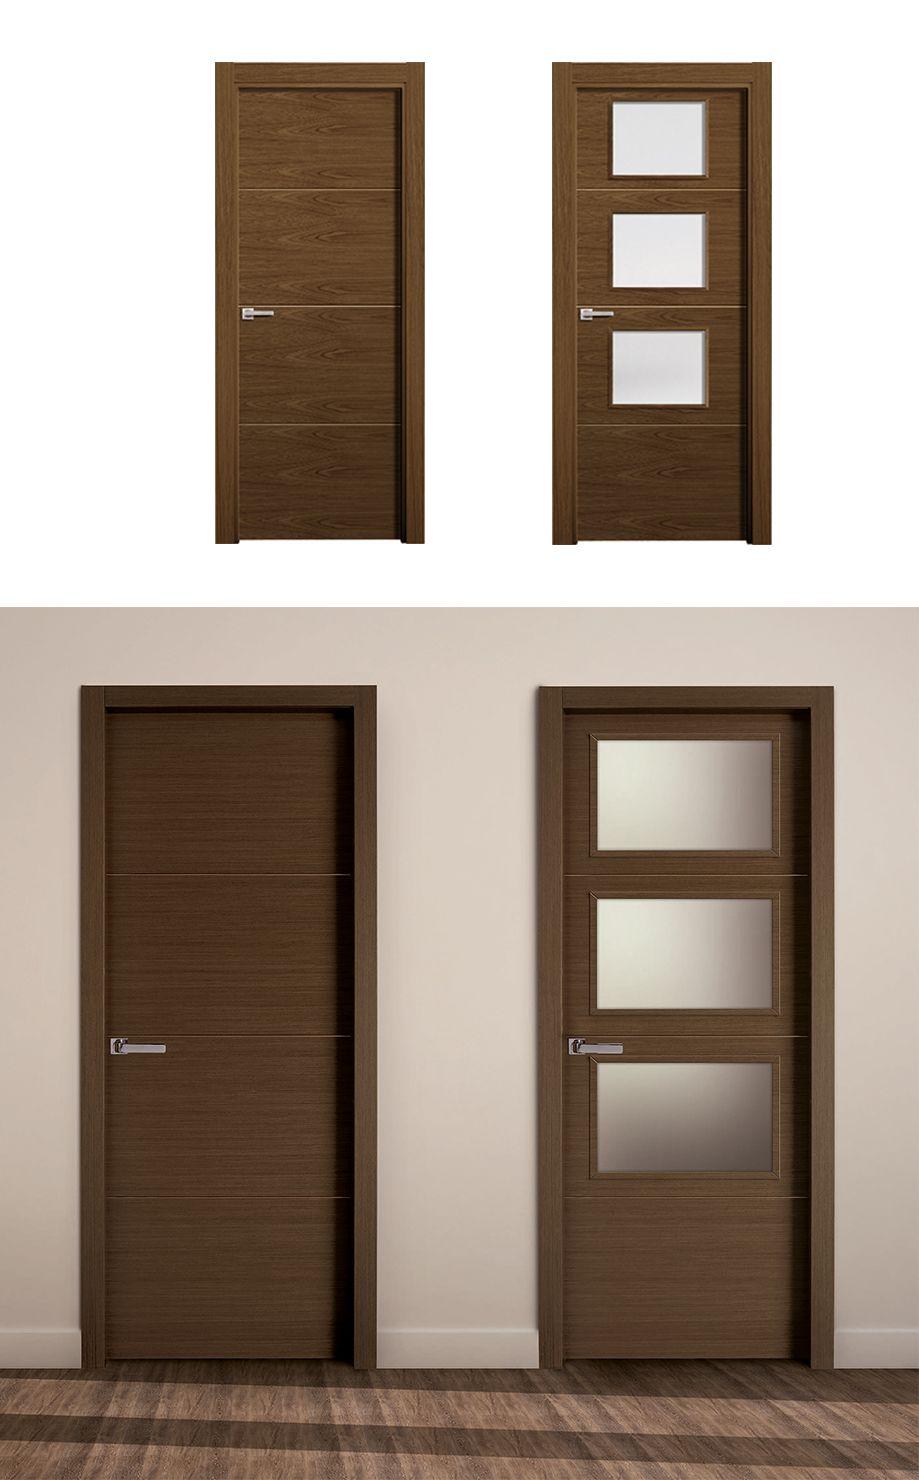 Puerta de interior oscura modelo ganges de la serie - Puertas de madera interiores modernas ...